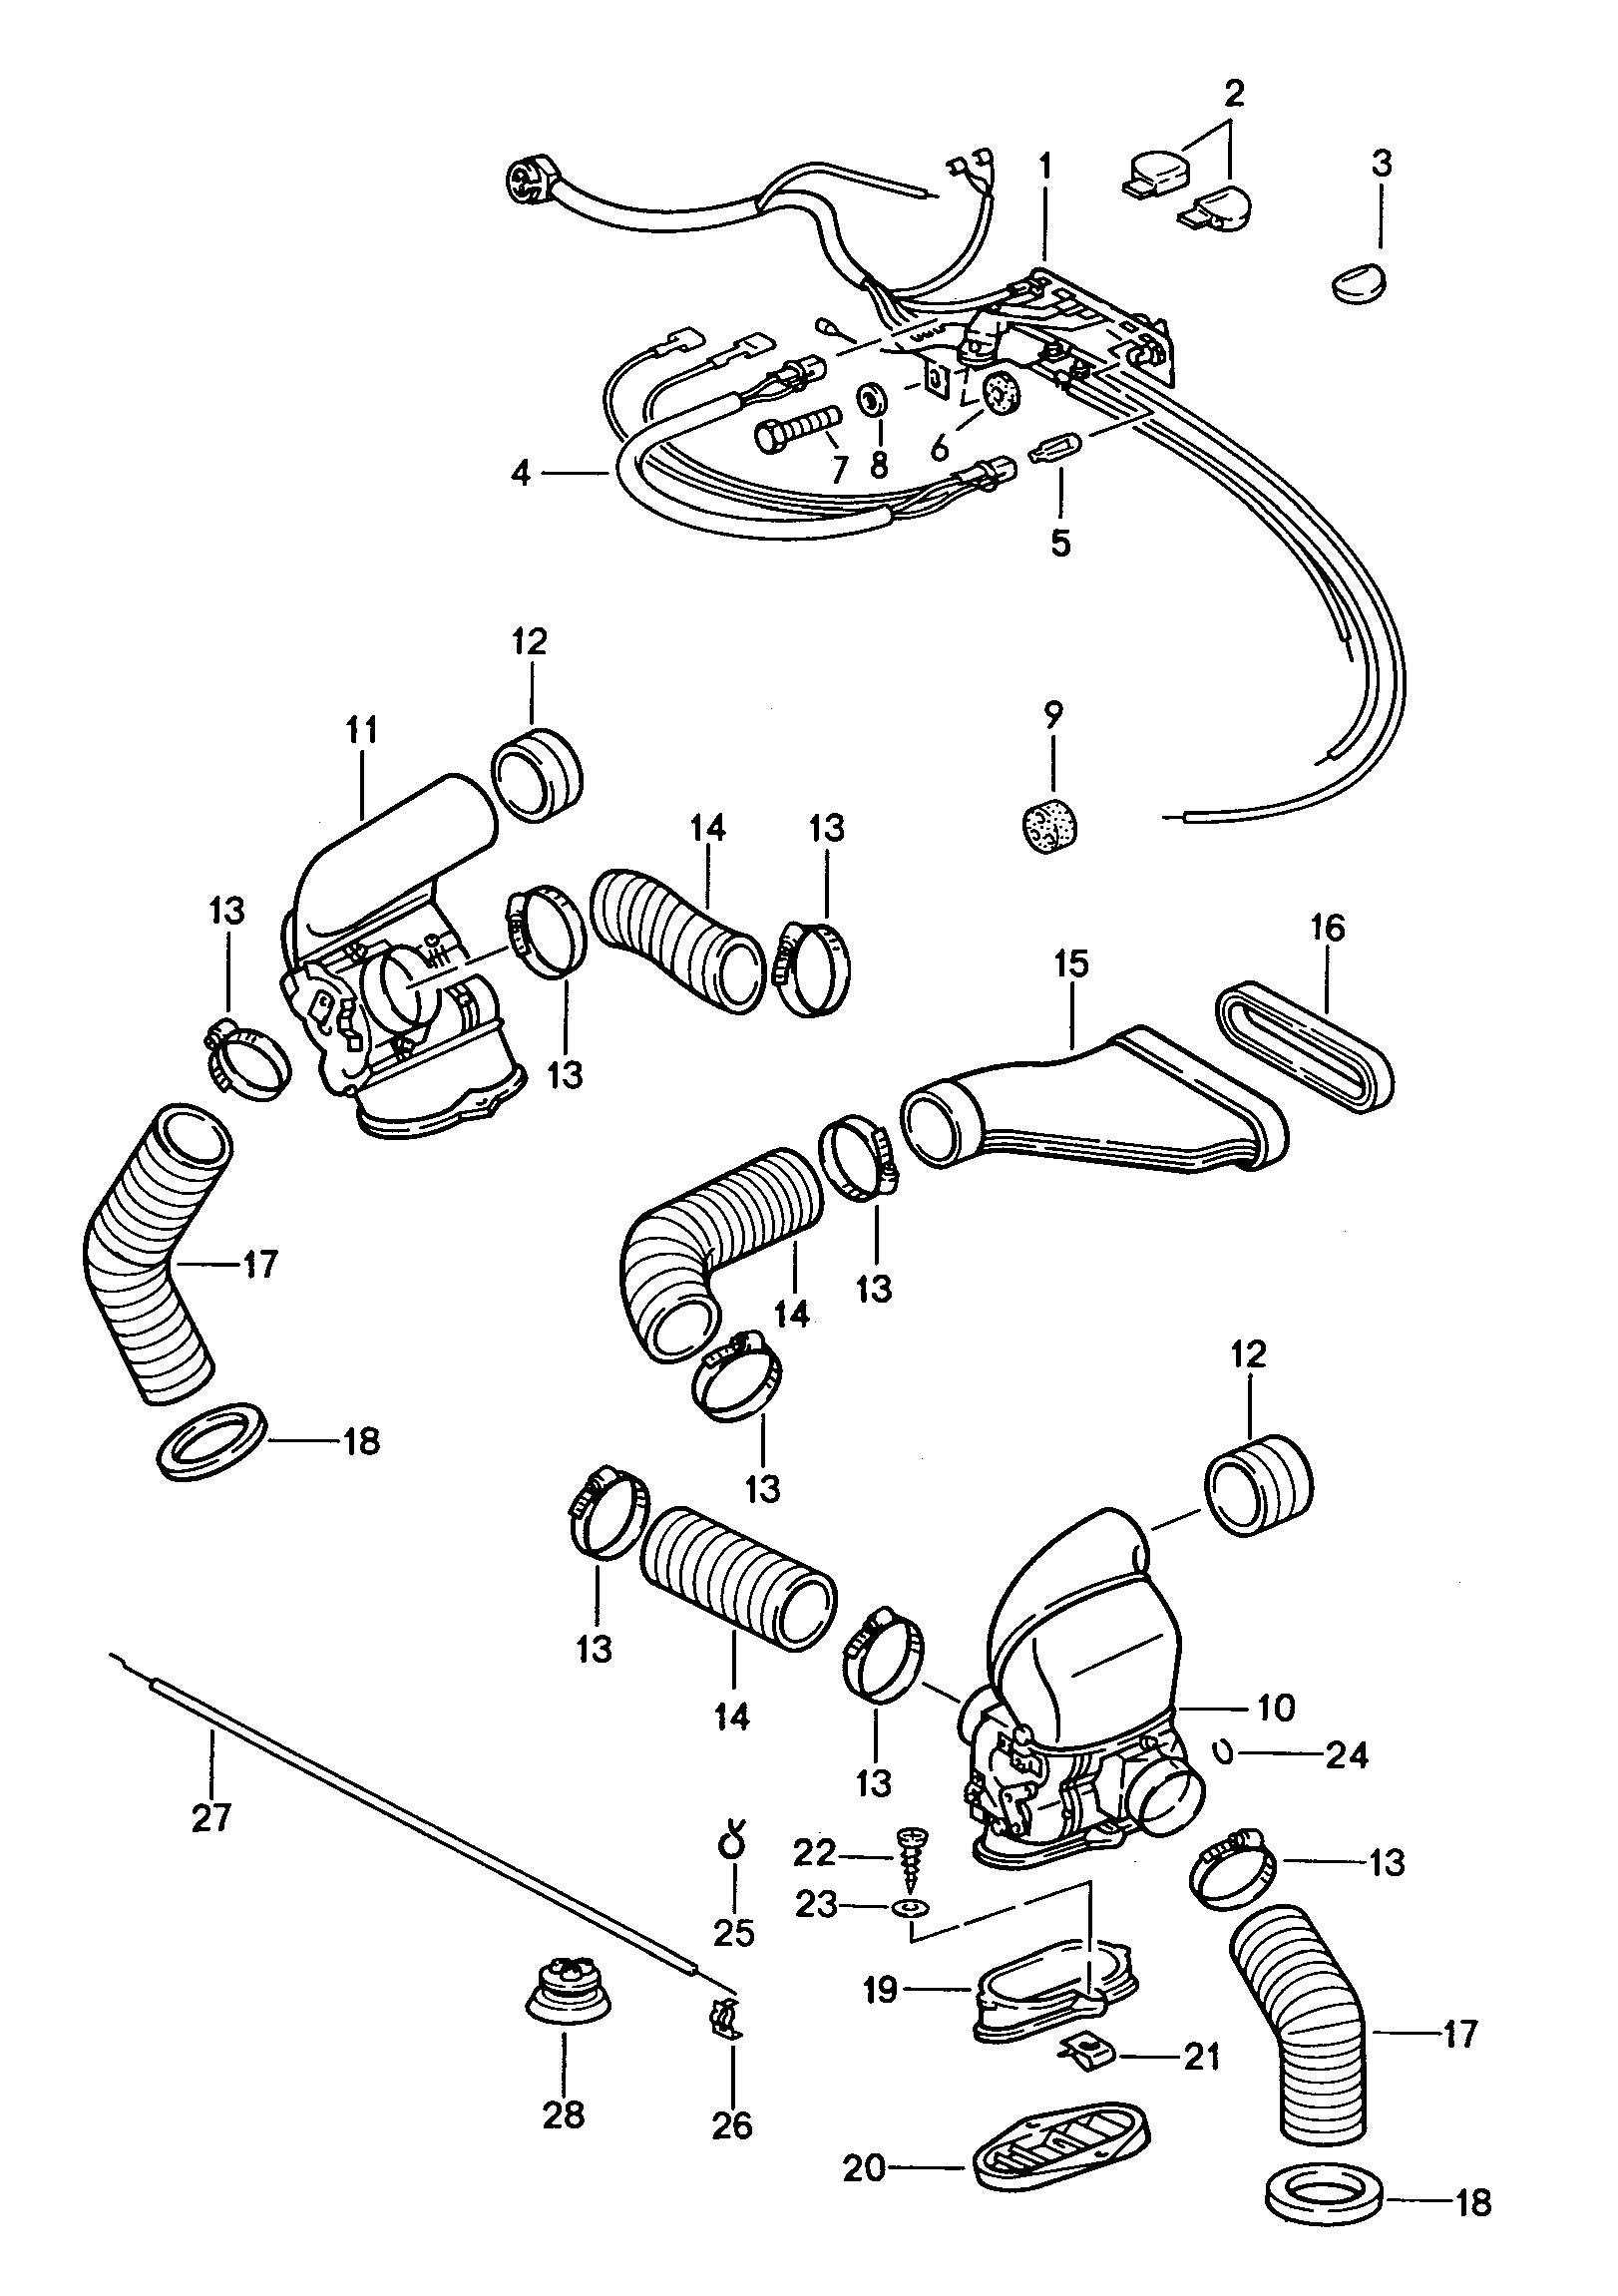 hight resolution of porsche 911 parking light diagram wiring diagram paper porsche 911 1987 1989 ventilation heating